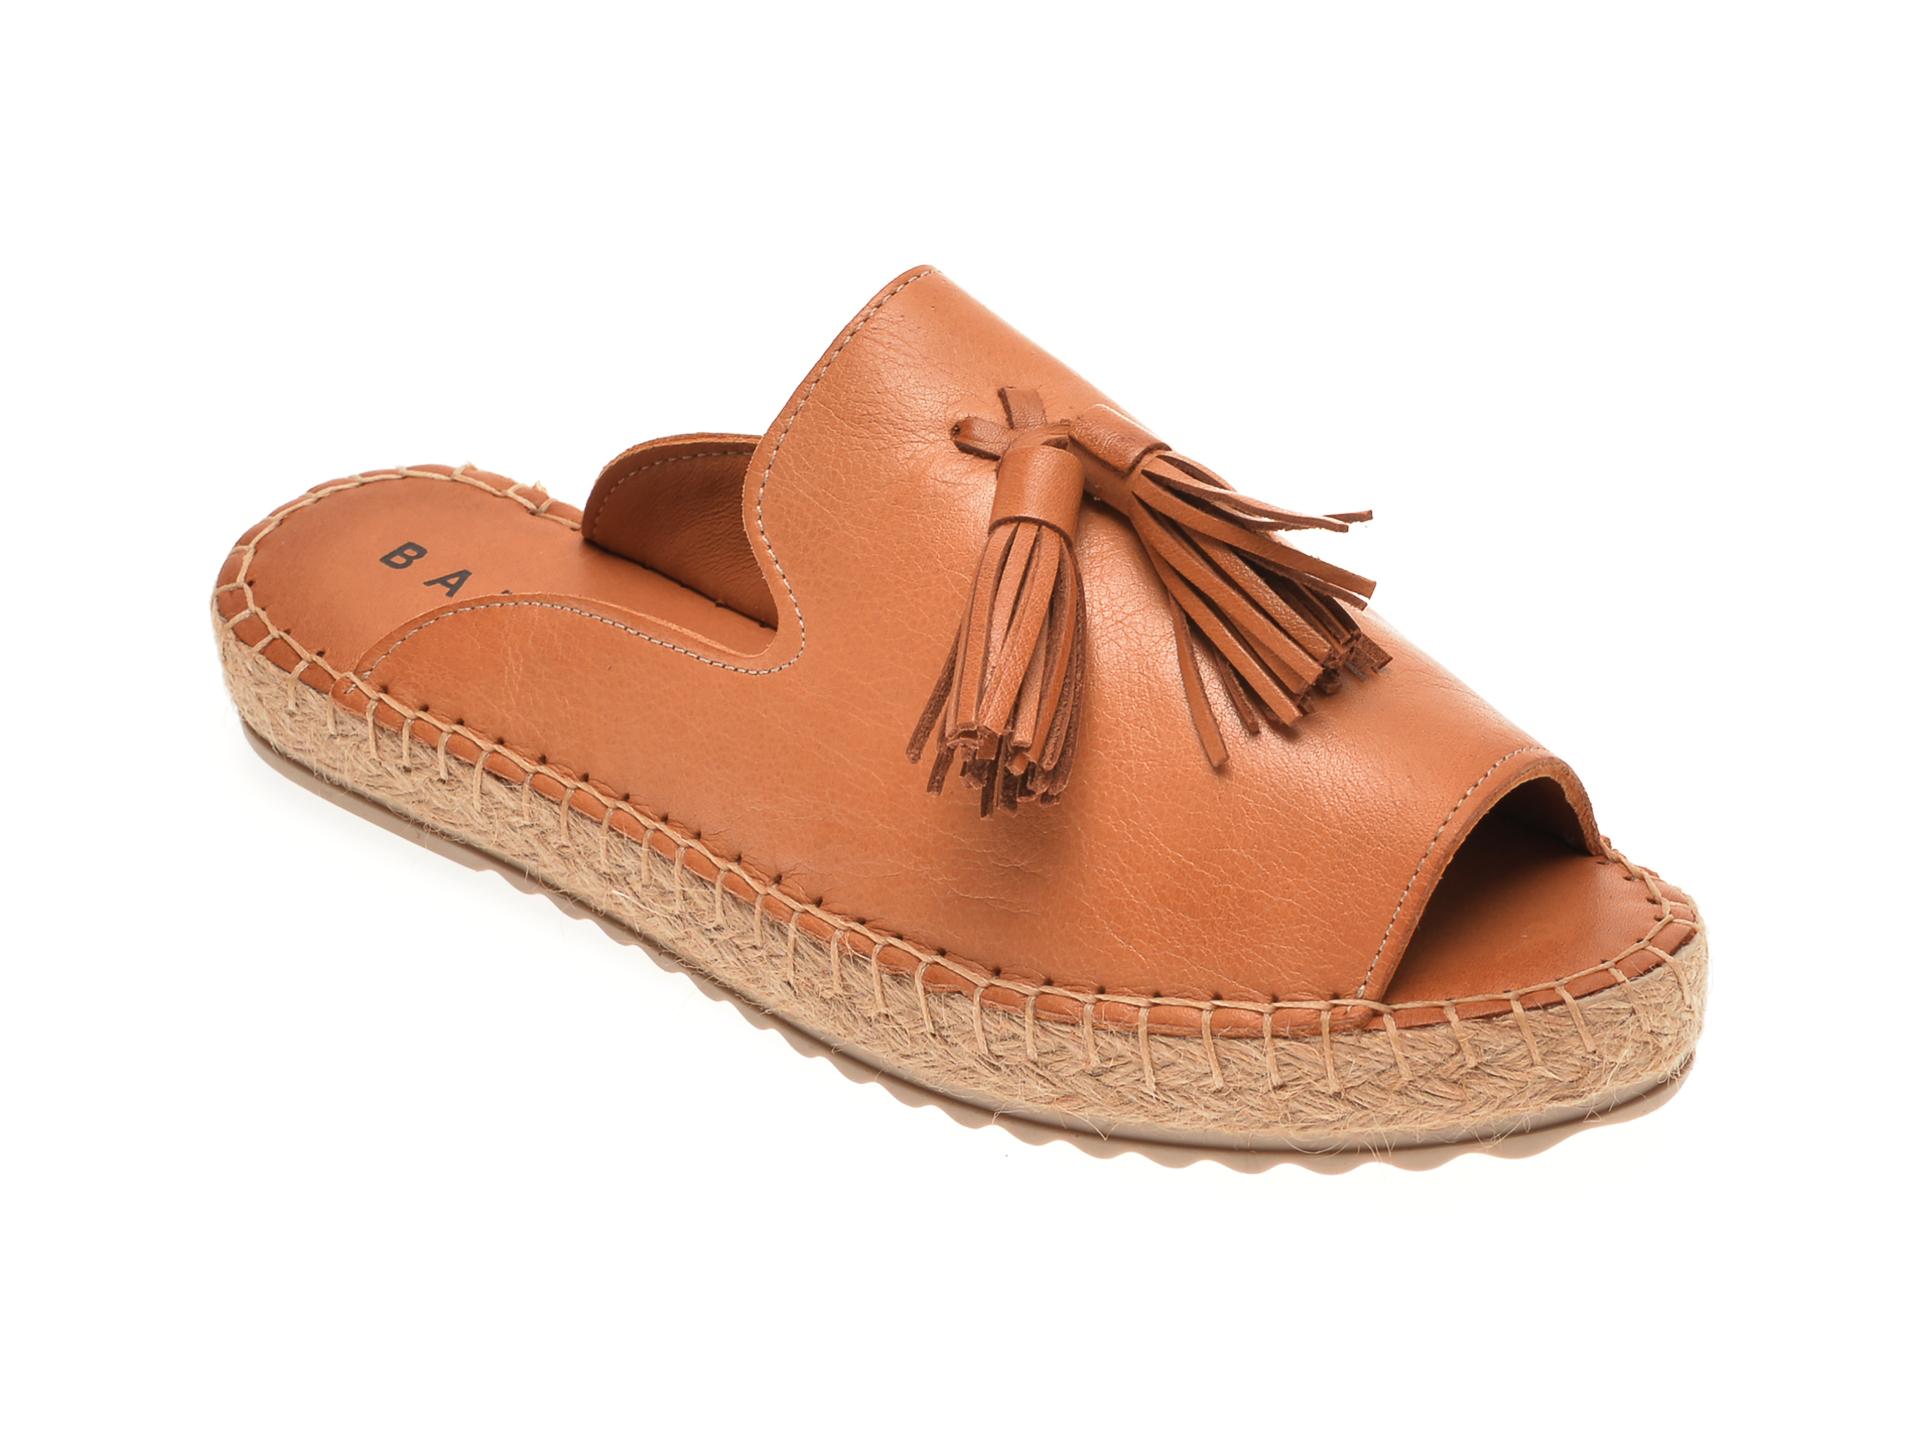 Papuci BABOOS maro, R07, din piele naturala imagine